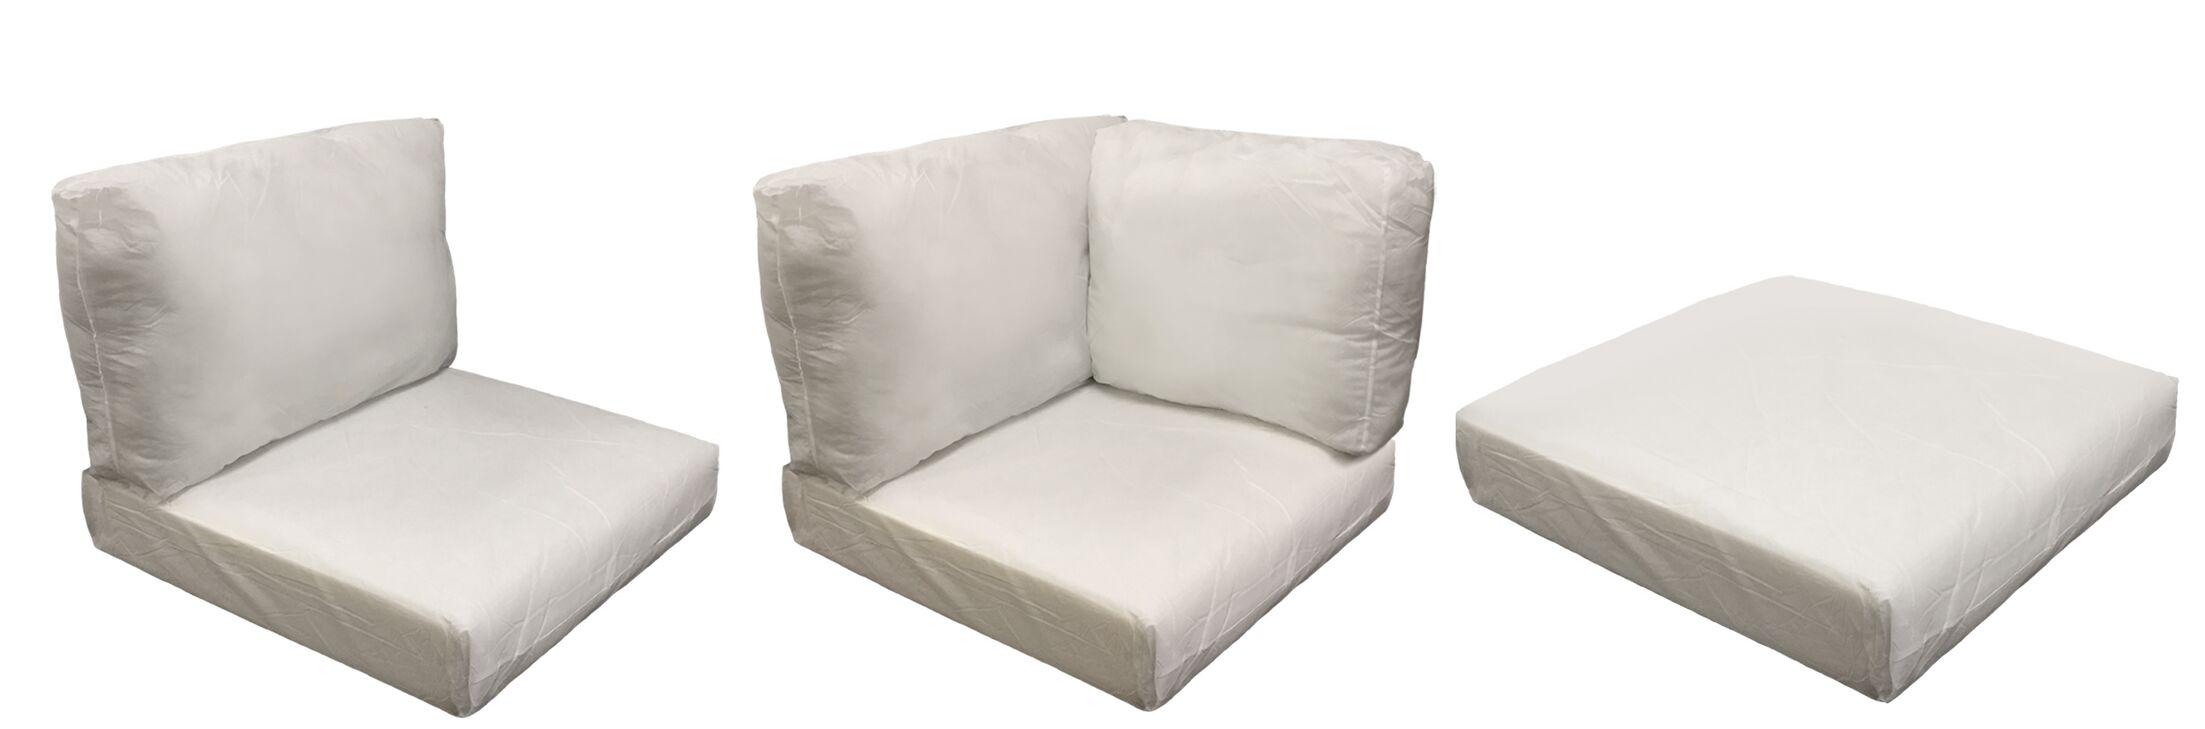 Coast 16 Piece Outdoor Cushion Set